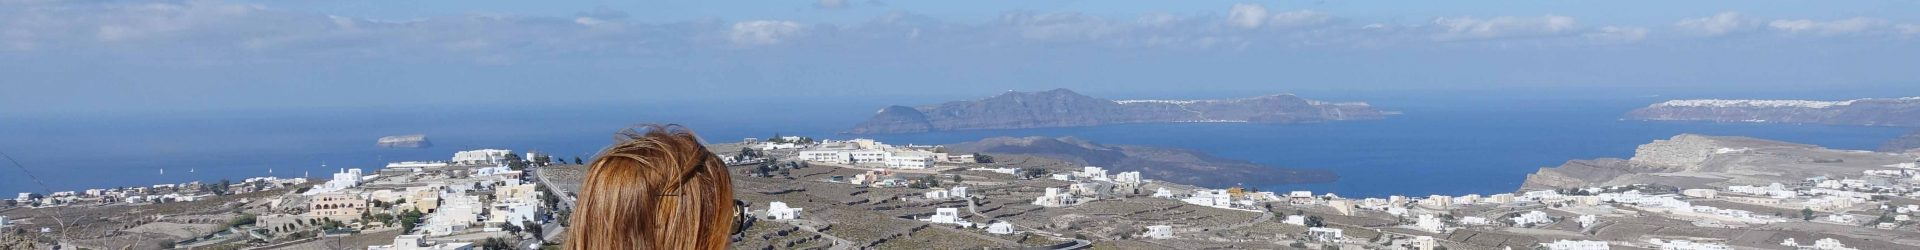 Pyrgos Kallistis: il villaggio pittoresco di Santorini